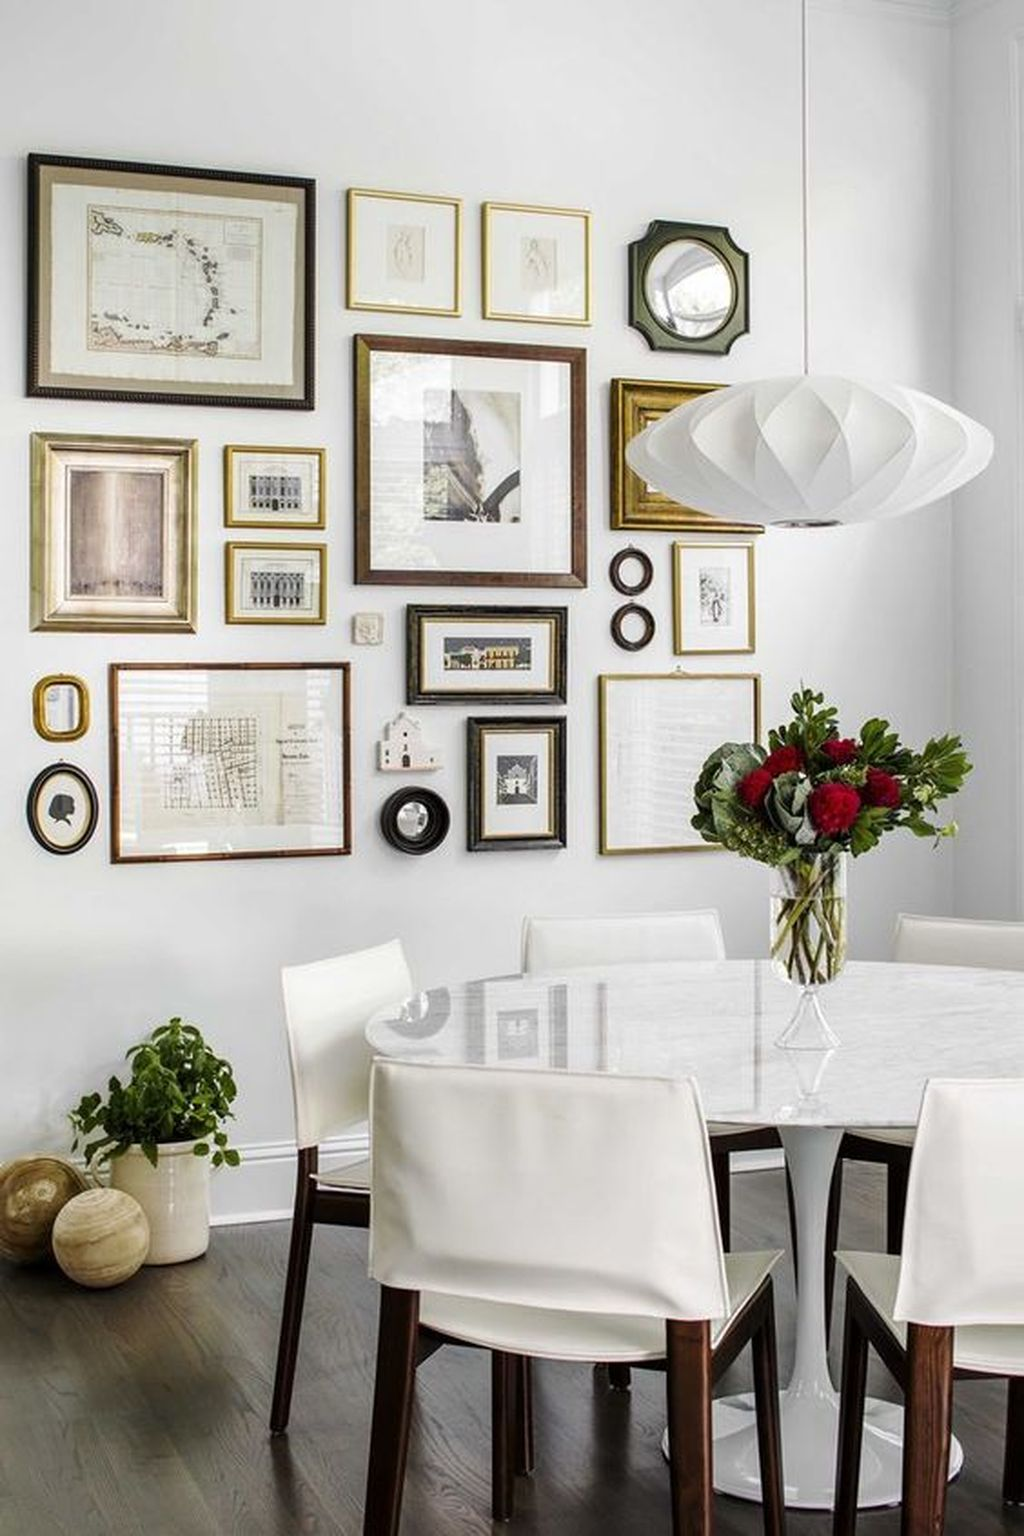 50 Simple Scandinavian Dining Room Ideas  Room Ideas Room And Prepossessing Scandinavian Dining Room Decorating Design